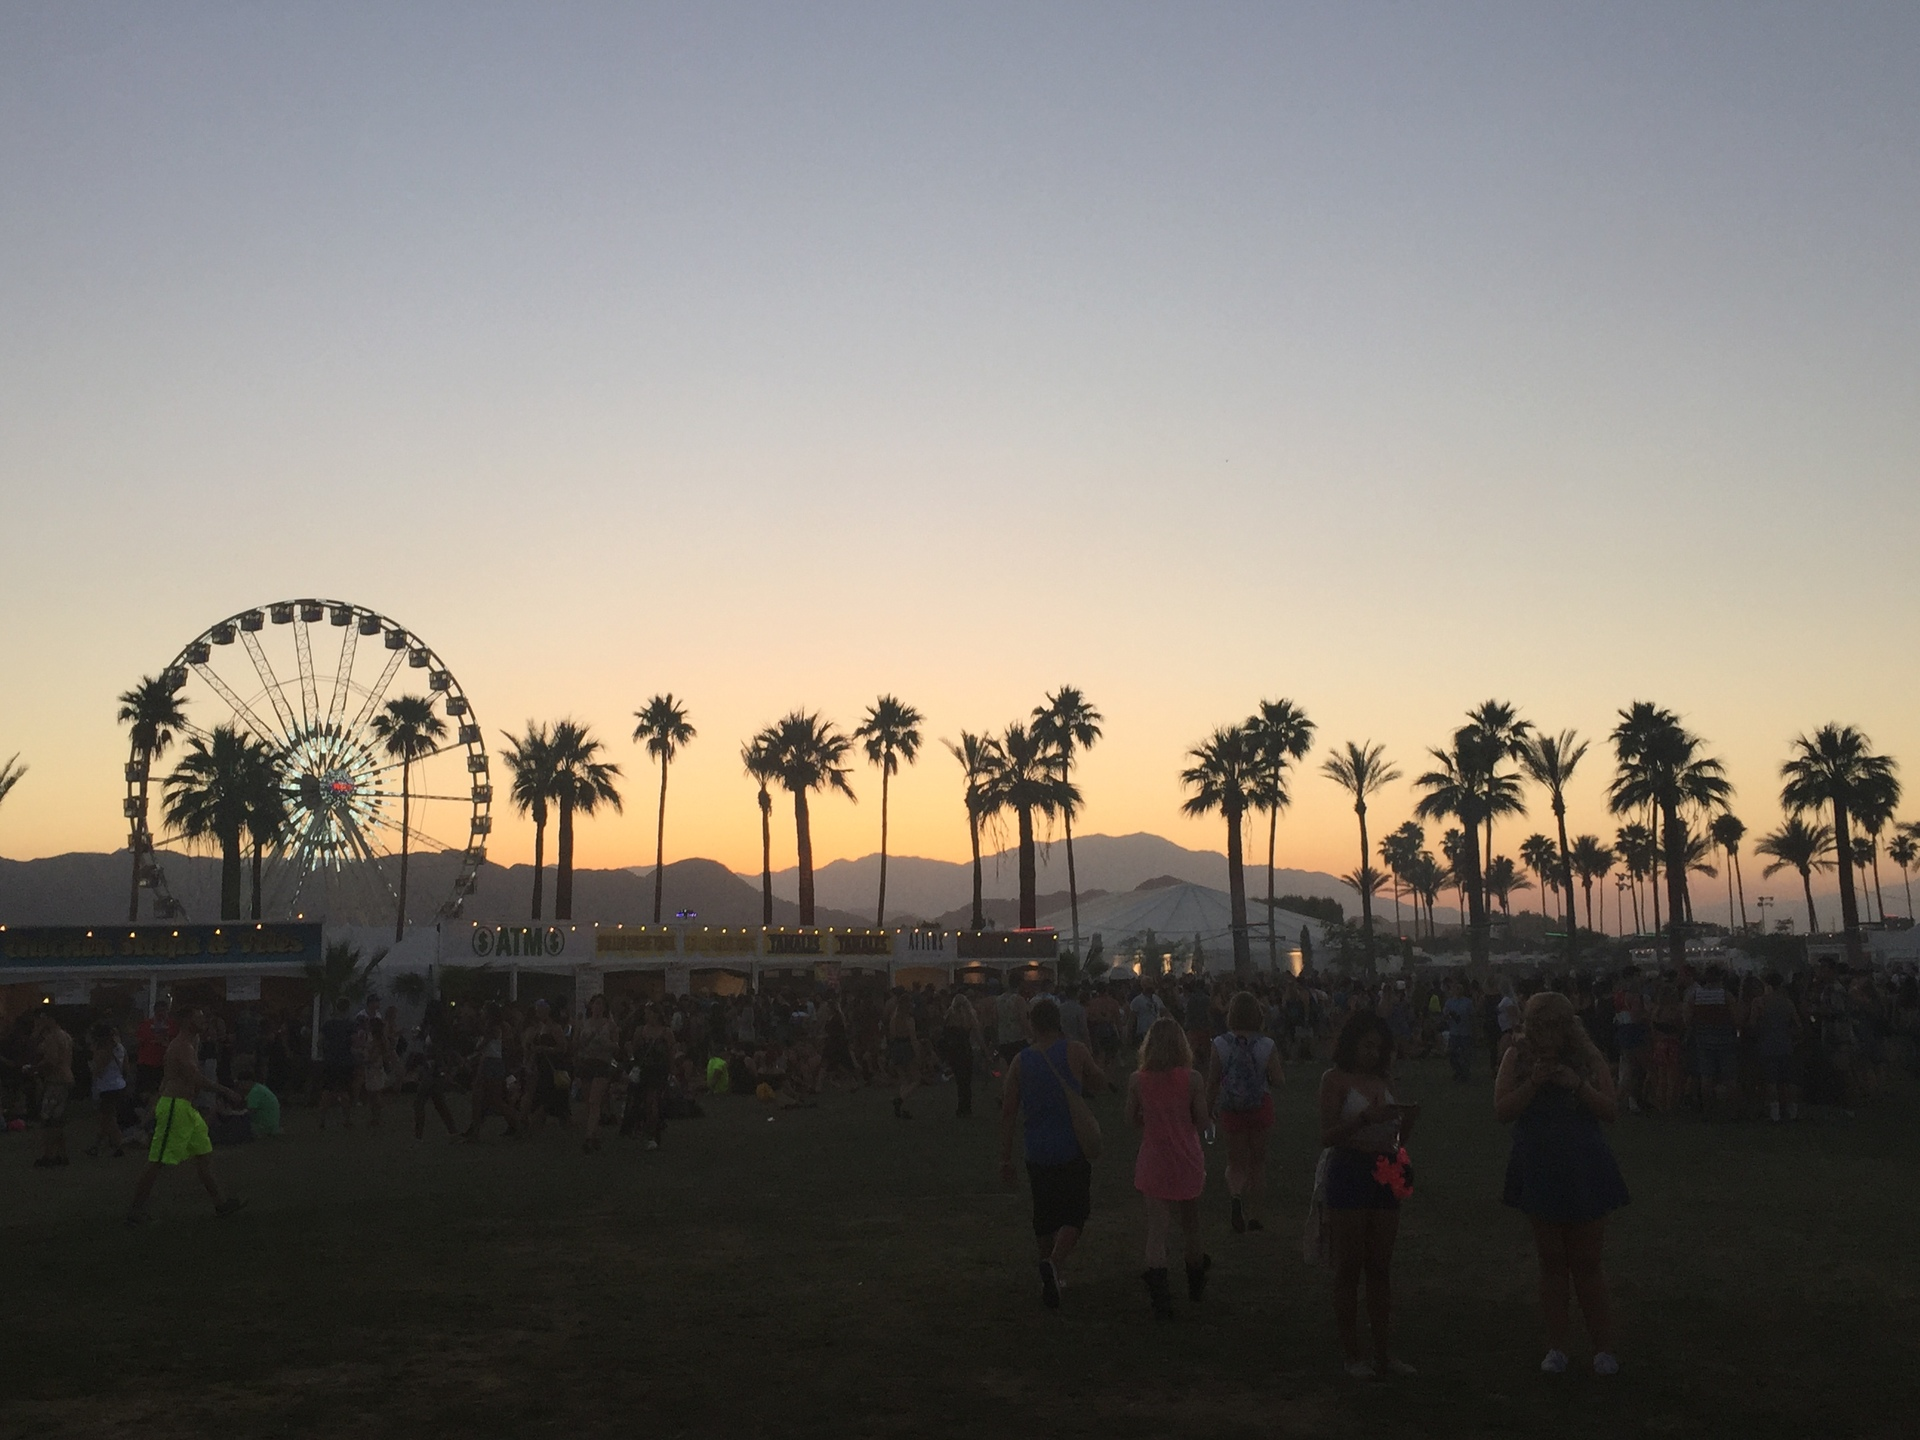 beach | leisure, recreation, people, festival